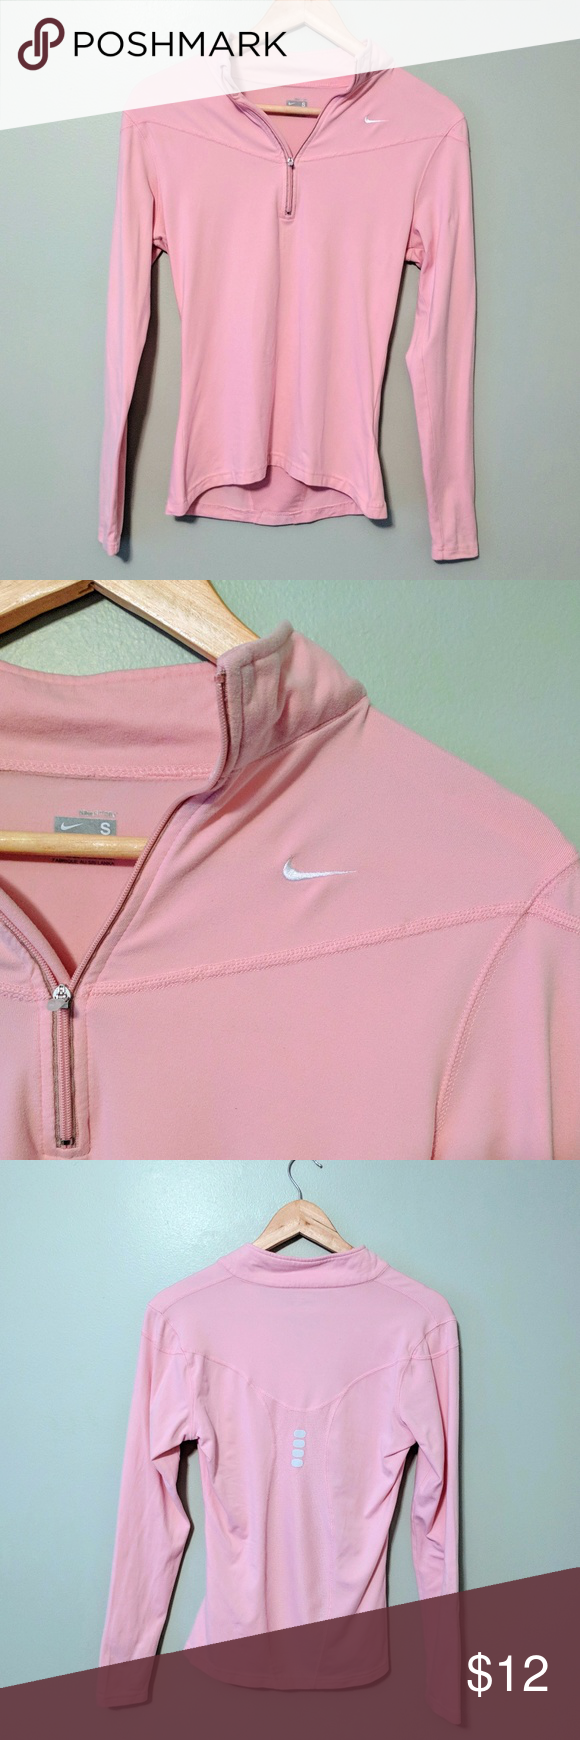 Blush Pink Nike Dry Fit Long Sleeve Sweatshirt Long Sleeve Sweatshirts Pink Nikes Long Sleeve Workout Top [ 1740 x 580 Pixel ]